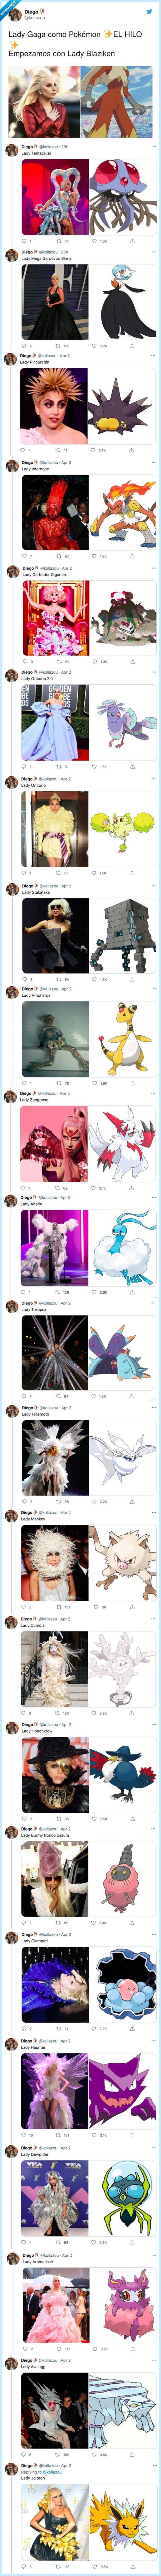 lady gaga,memes,pokemon